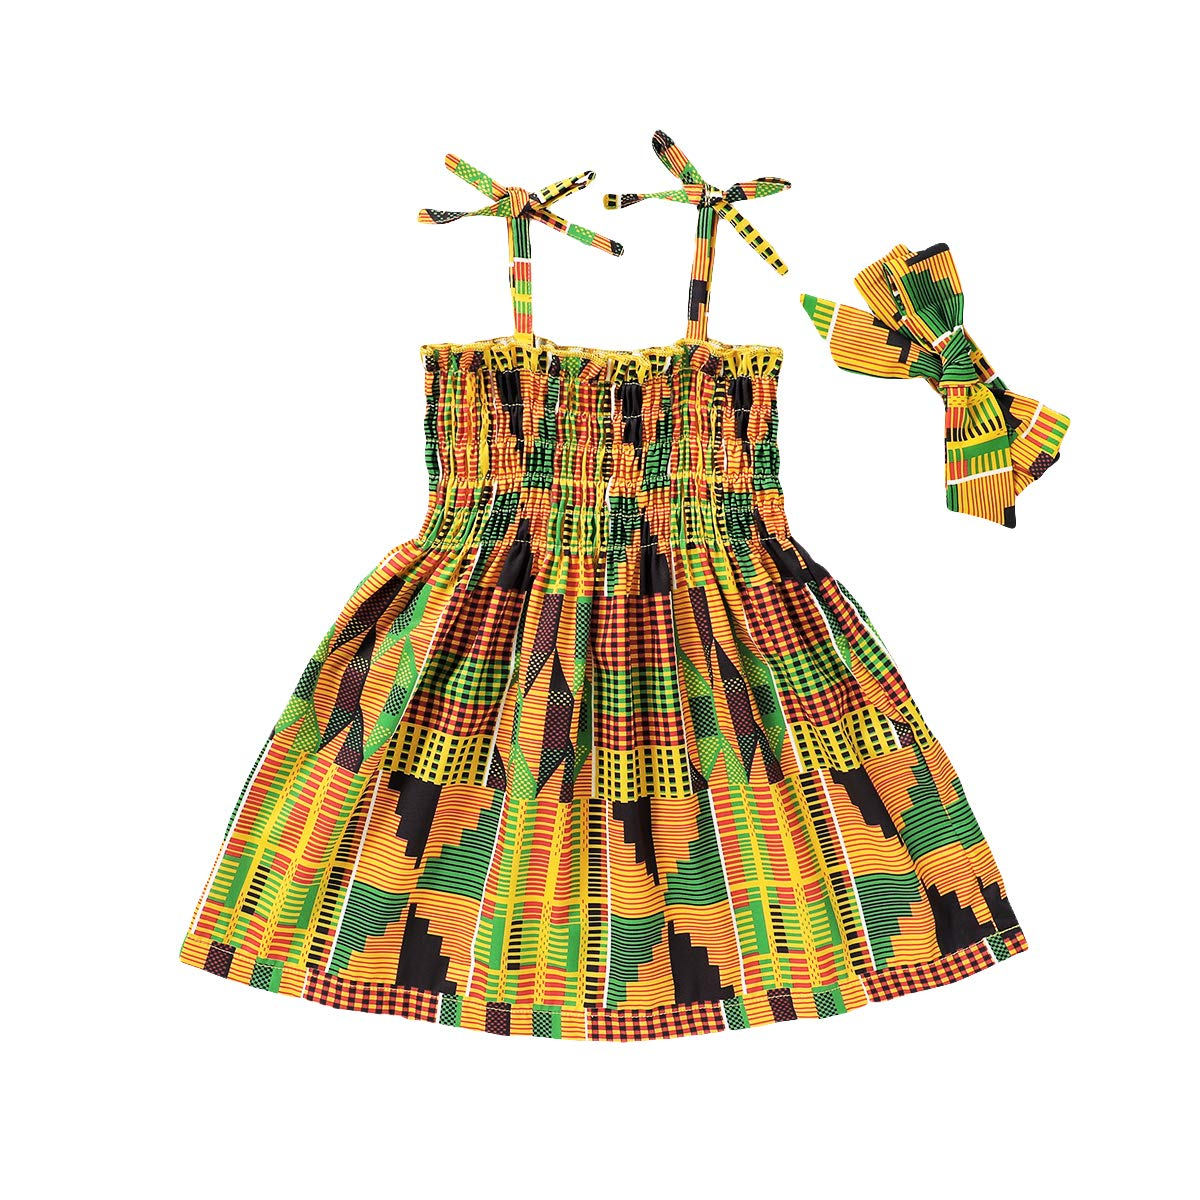 Toddler Kids Baby Girl Dress African Ethnic Style Printed Tradition Infant Dress Up Short Skirt Headband 2Pcs Sets